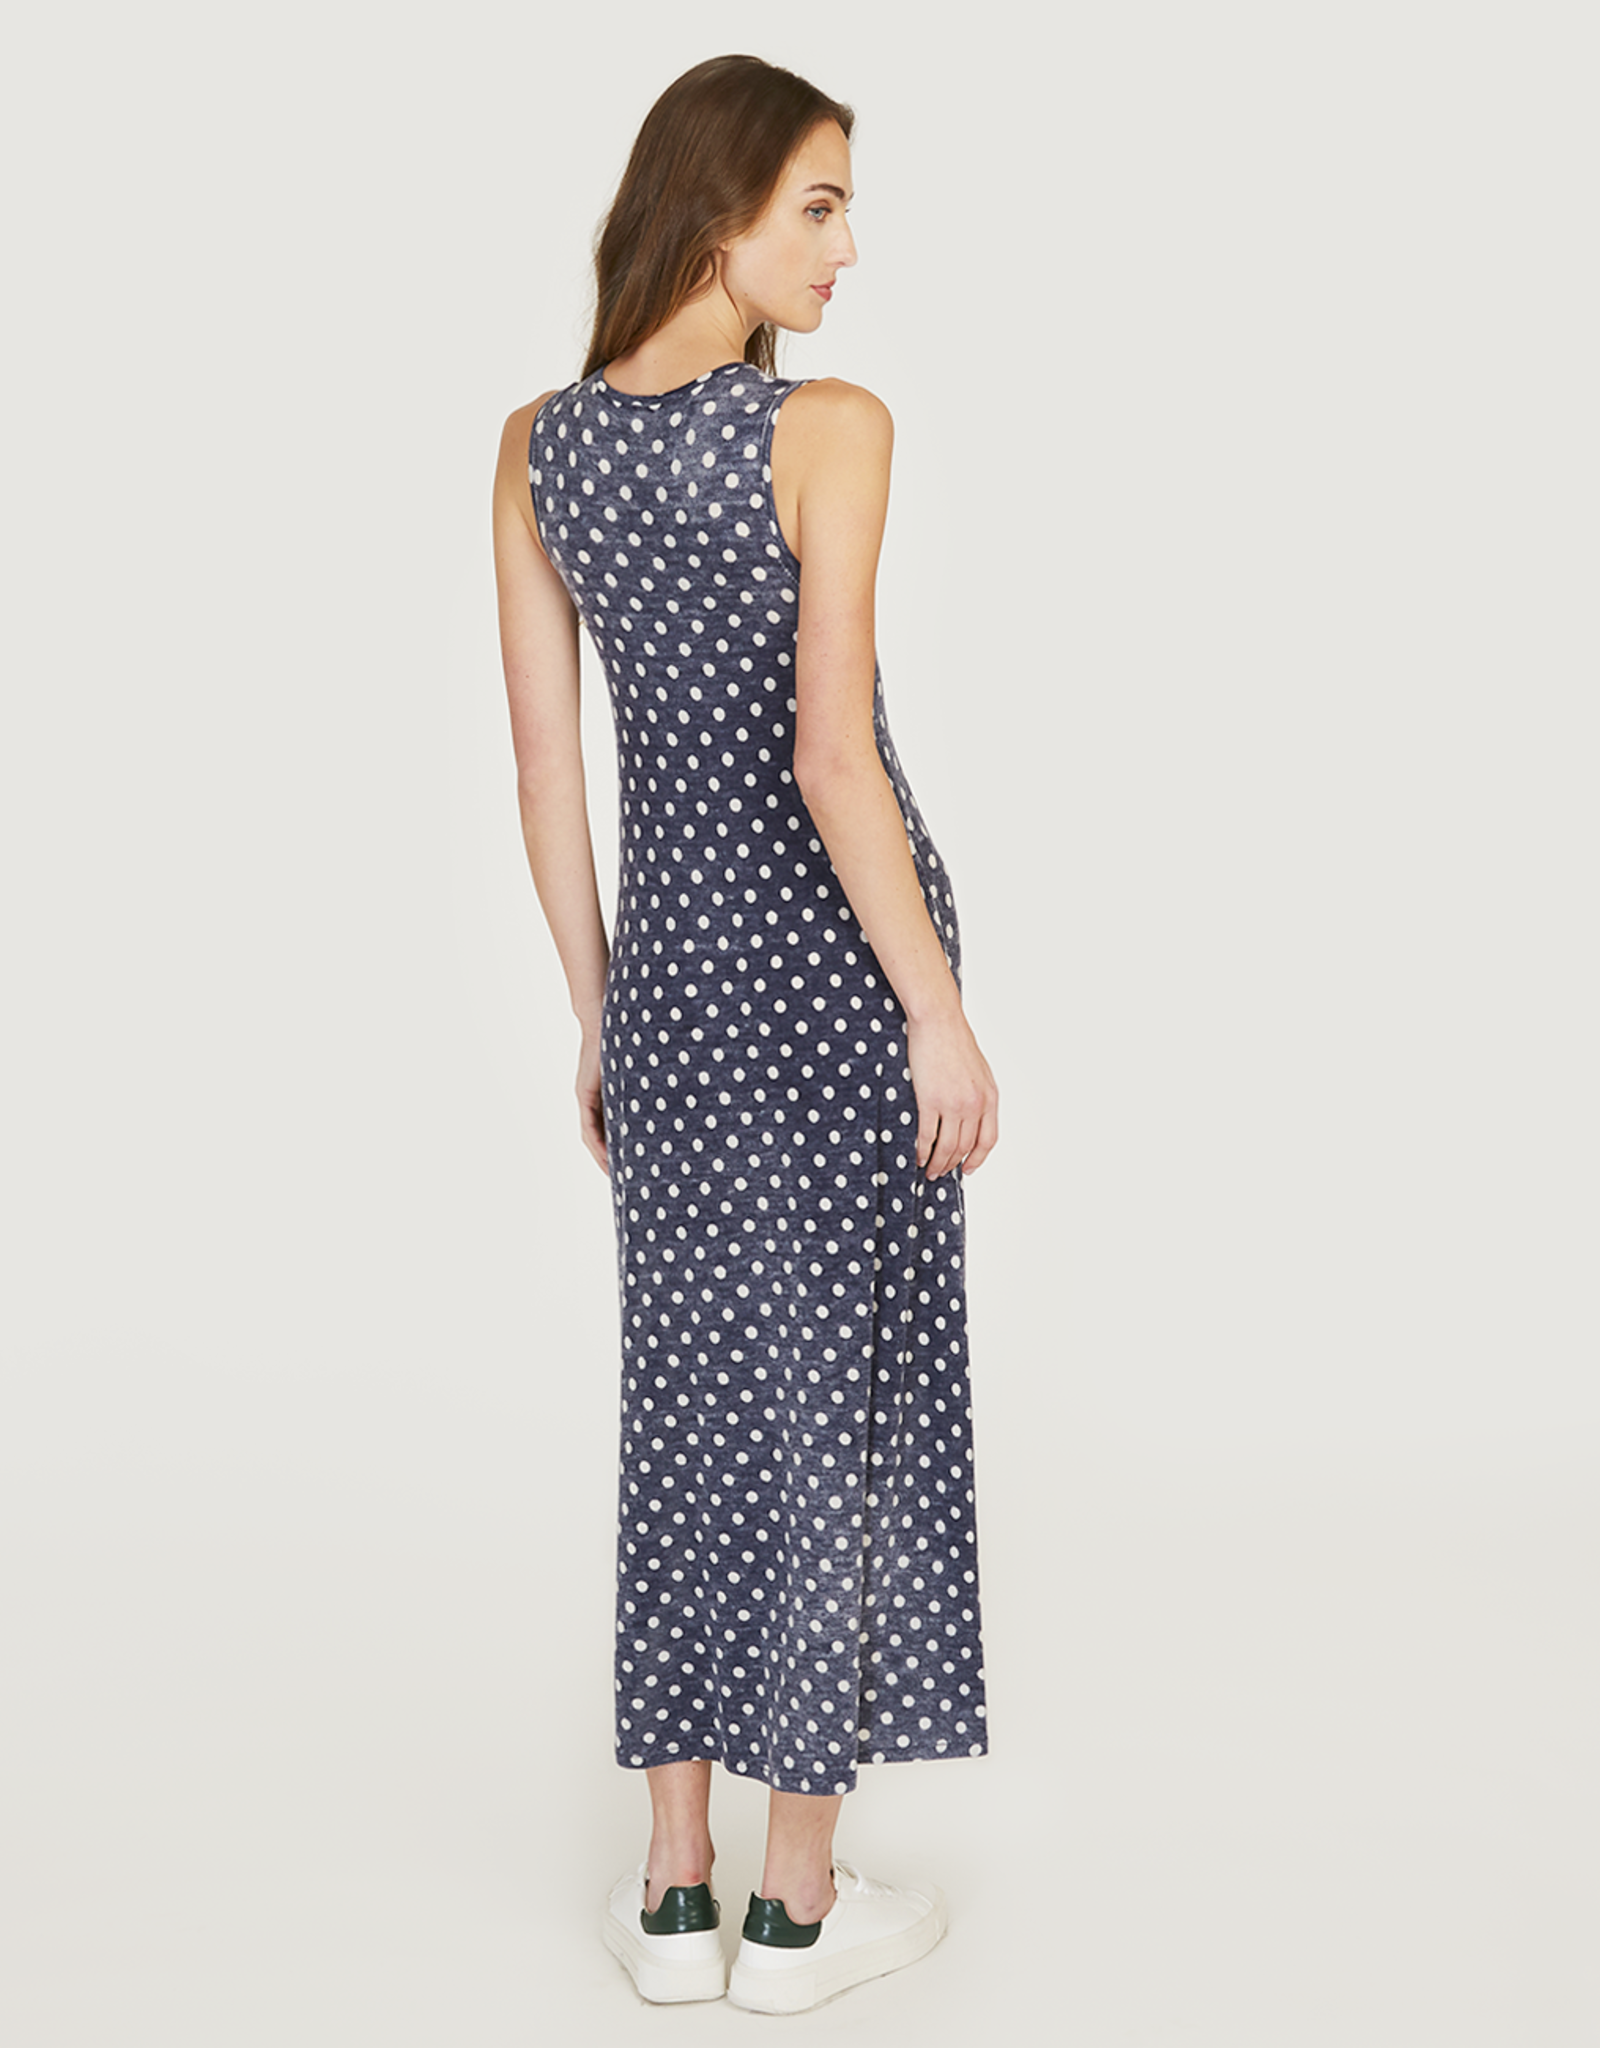 Autumn Cashmere Polka Dot Flare Dress RP12435